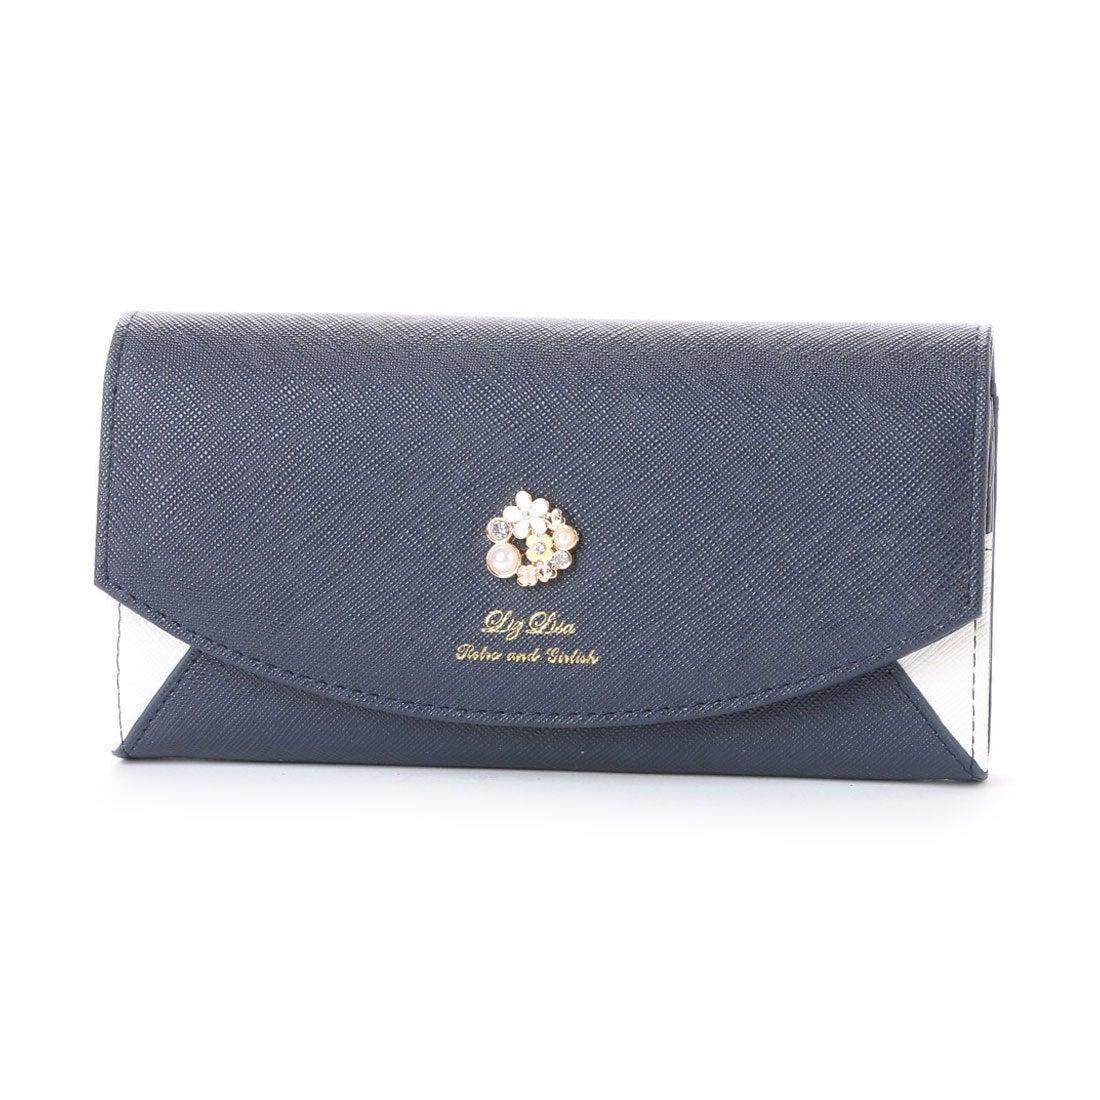 5cc121a219e4 リズリサ LIZ LISA ポピー お花ブローチ付配色長財布 (ネイビー) -アウトレット通販 ロコレット (LOCOLET)